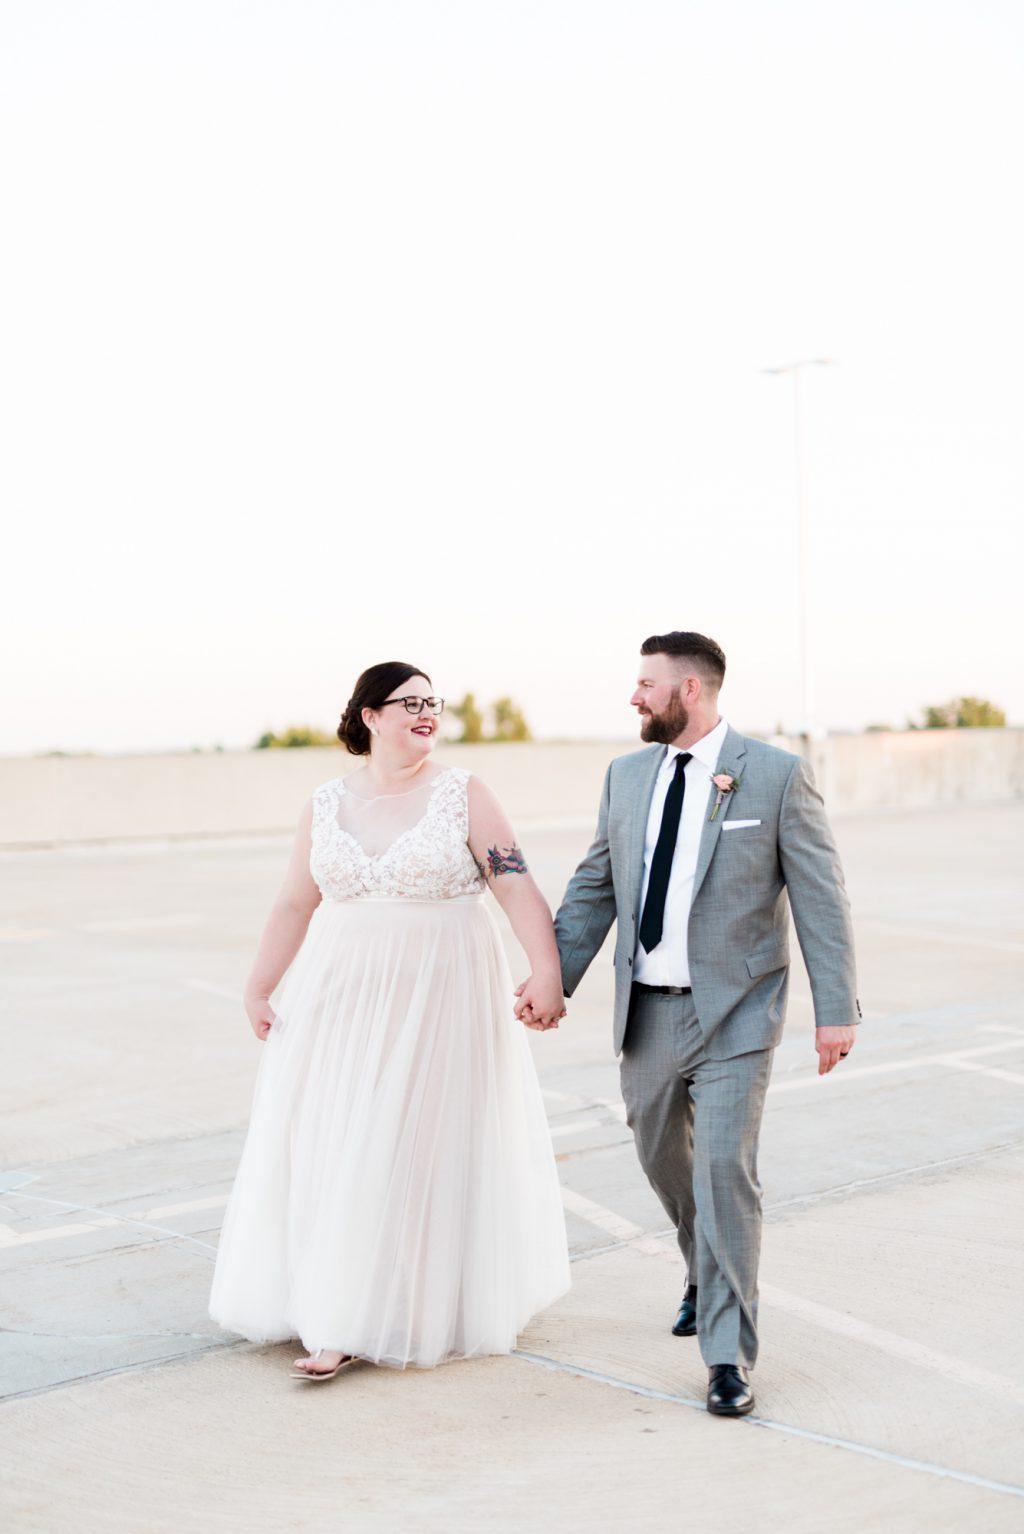 haley-richter-photo-west-chester-summer-wedding-boxcar-brewery-192